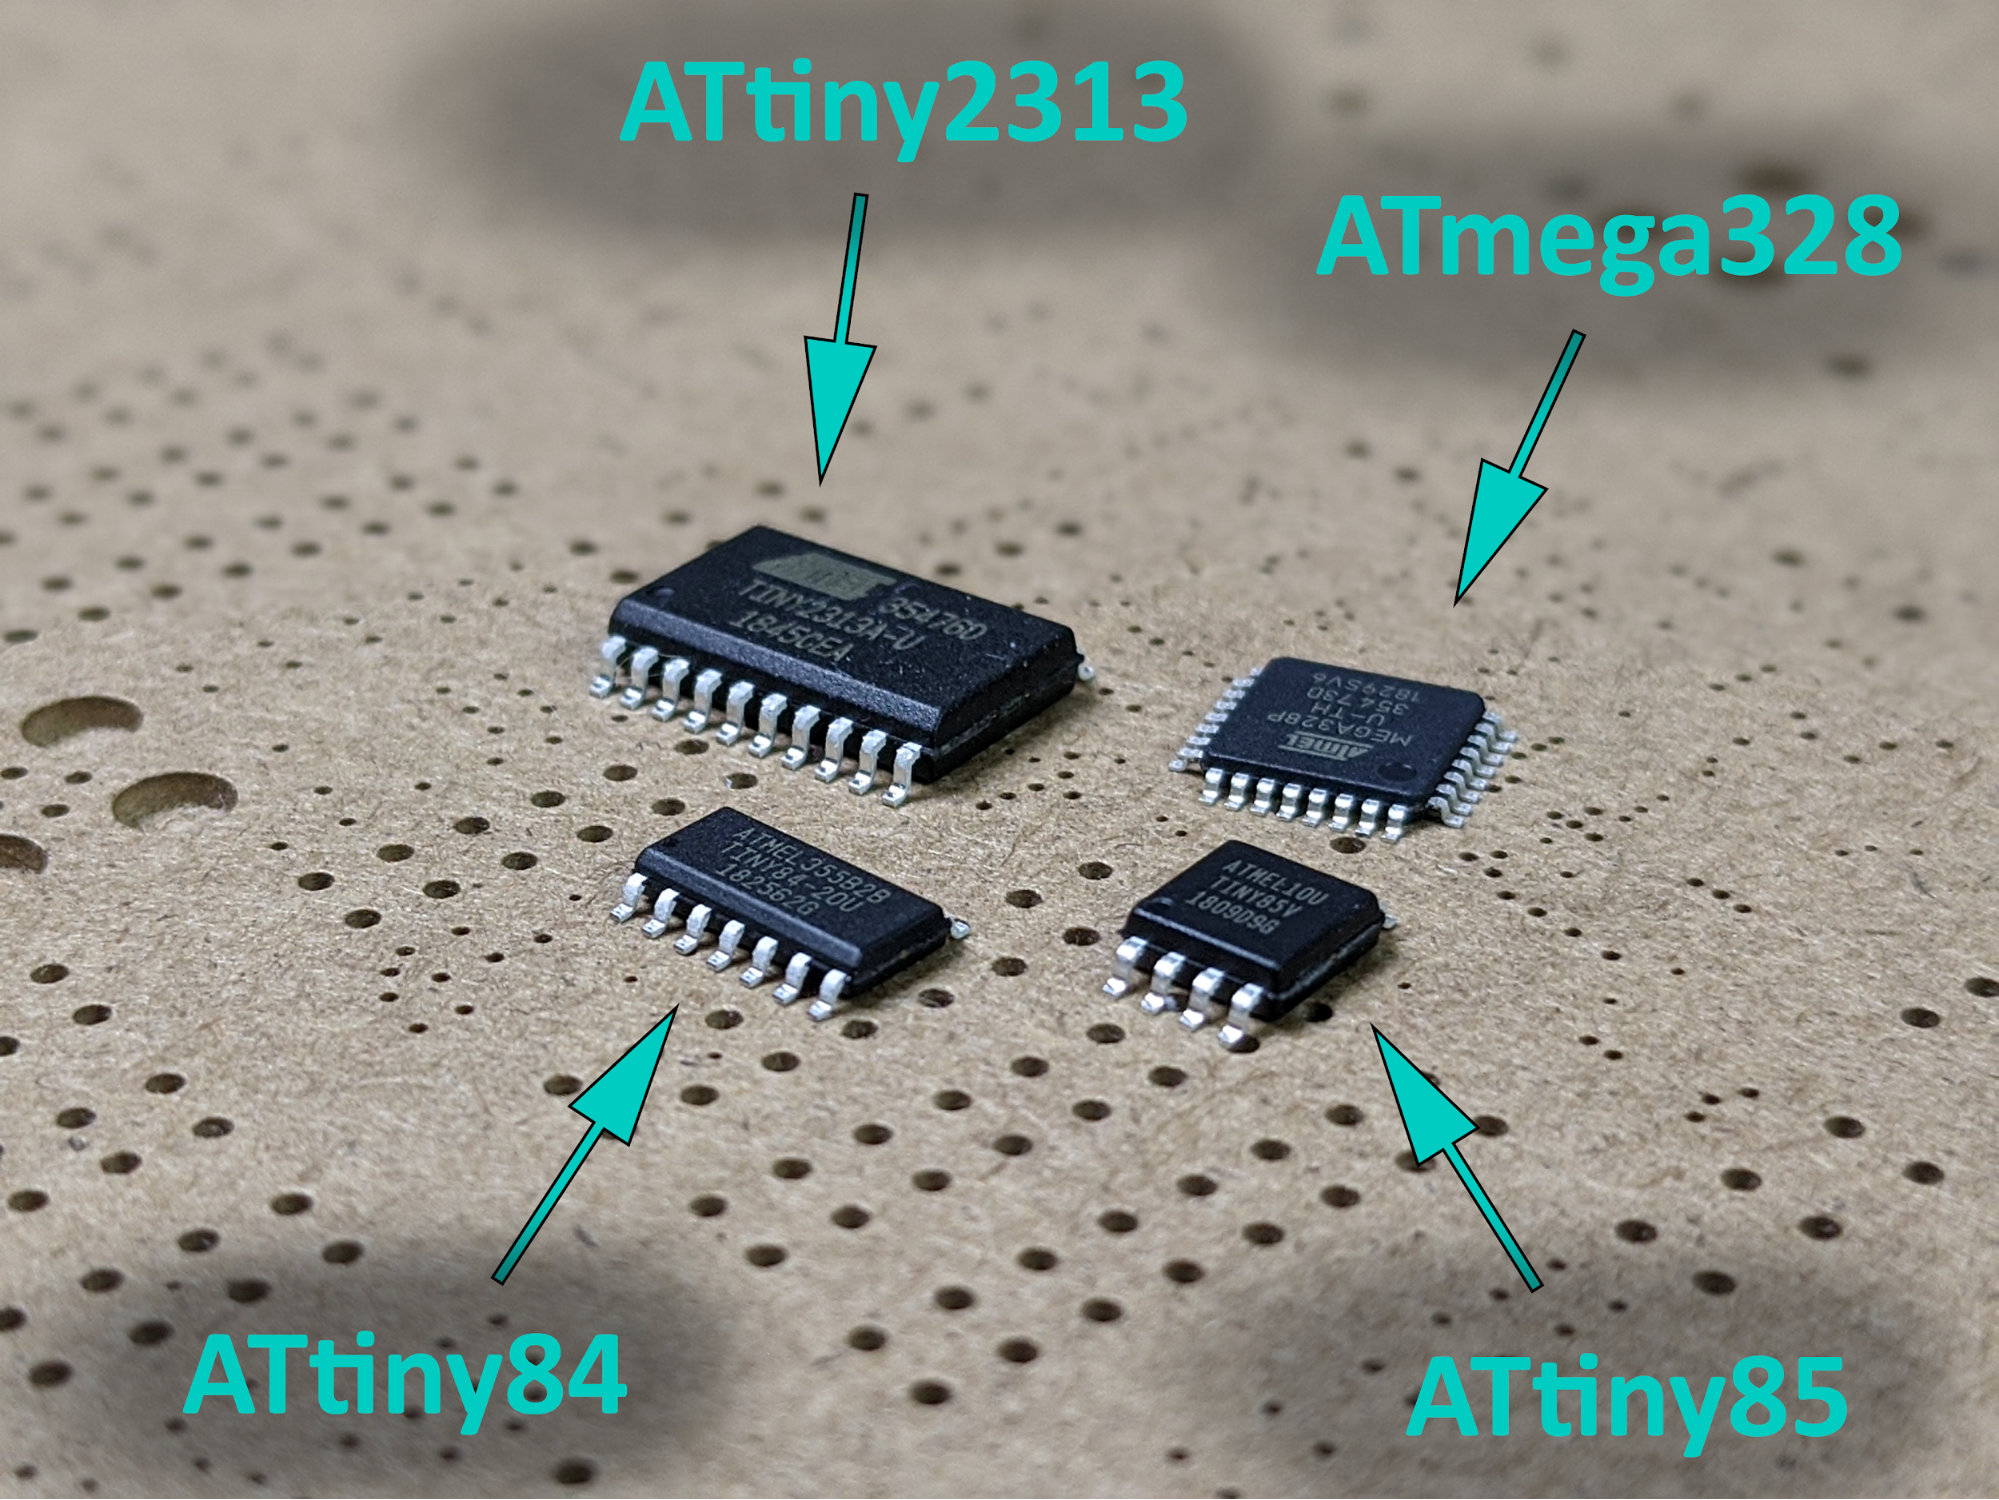 ATtiny_MCU_Preprogrammed_Chips_SH_MP_image6.png